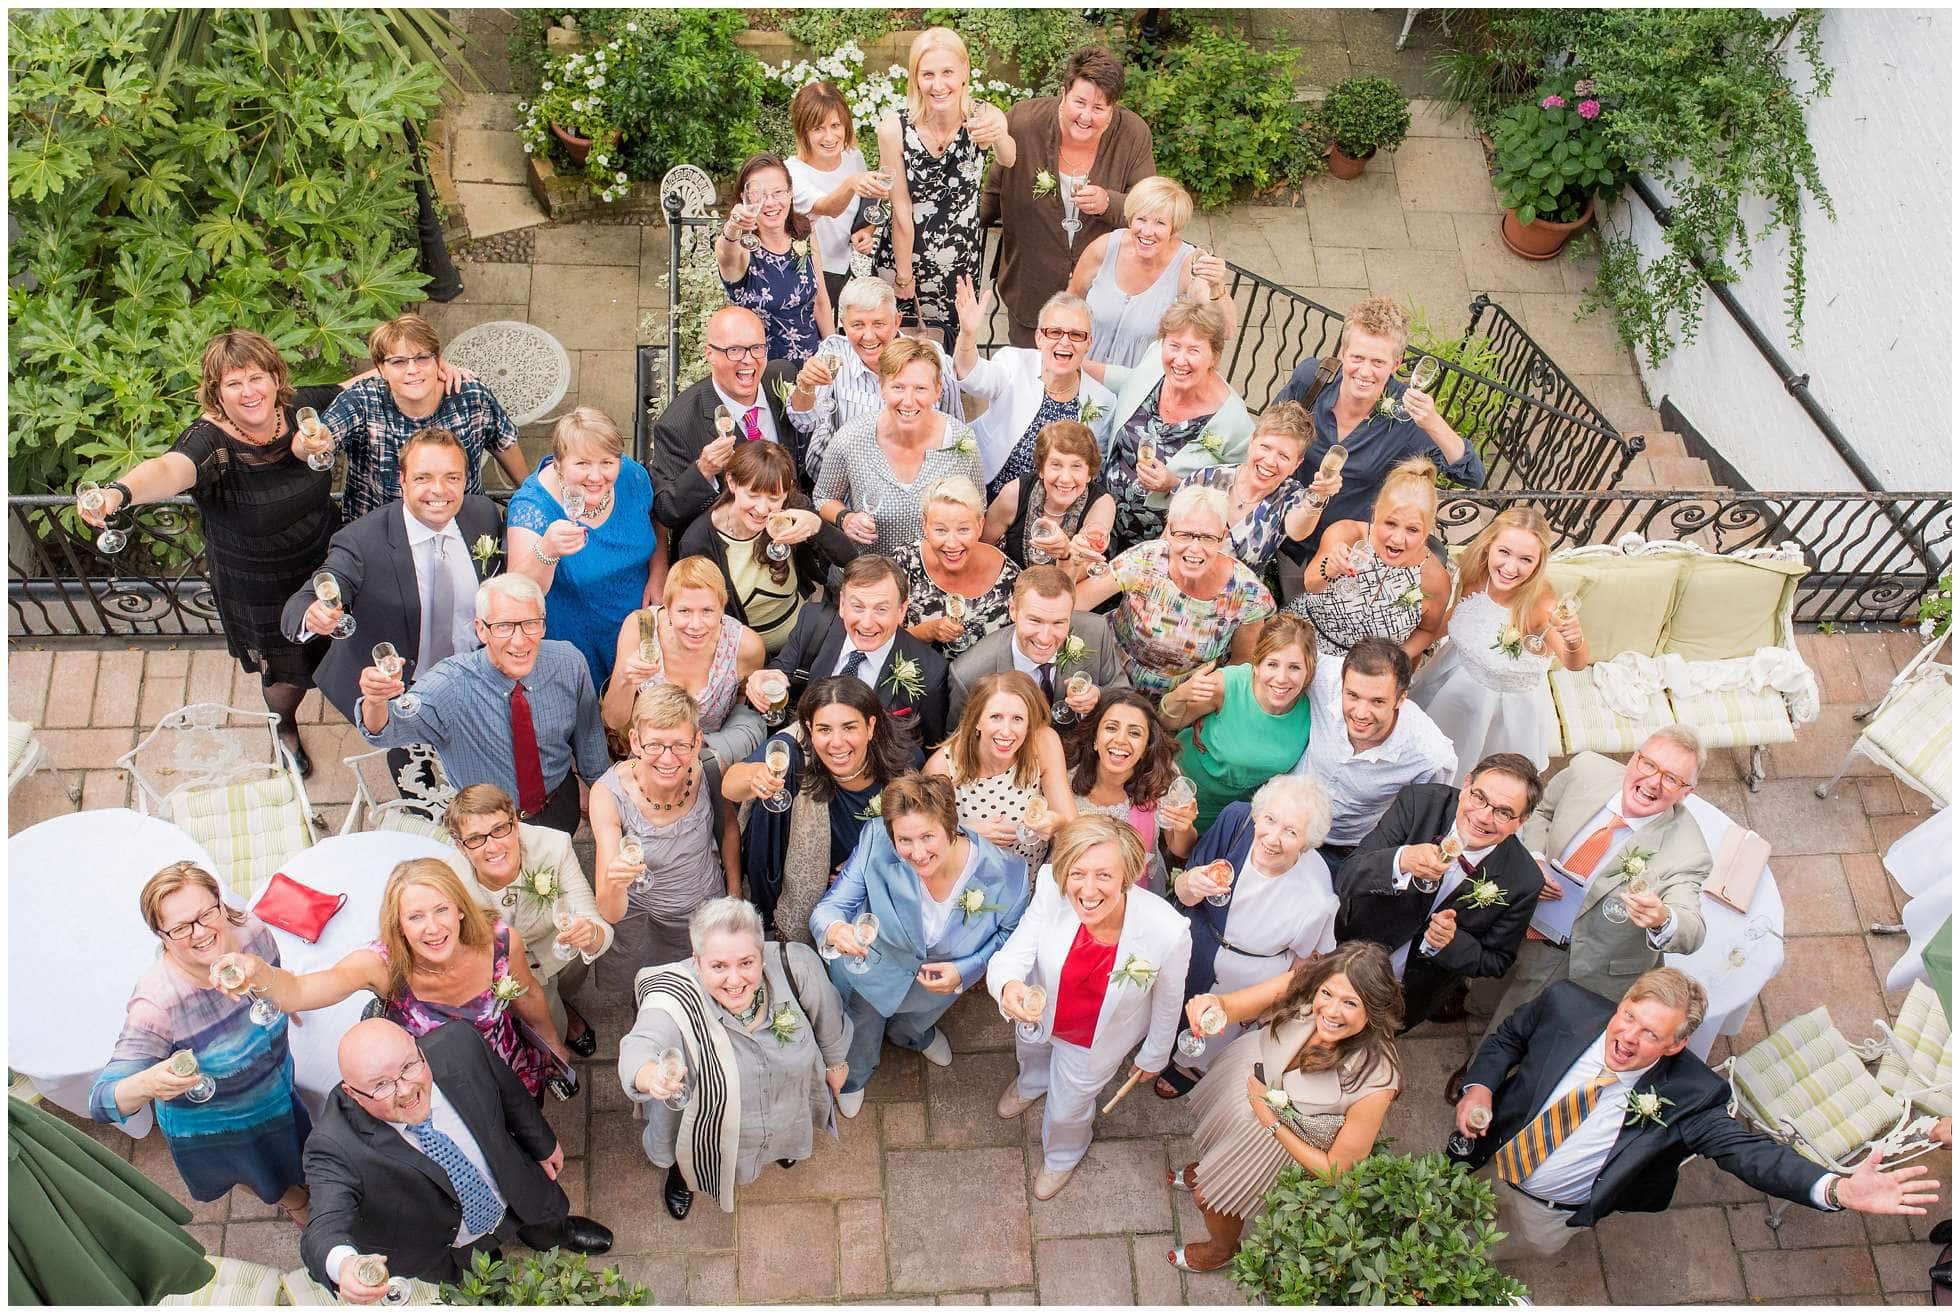 Huge group shot at University Women's Club, Mayfair, London